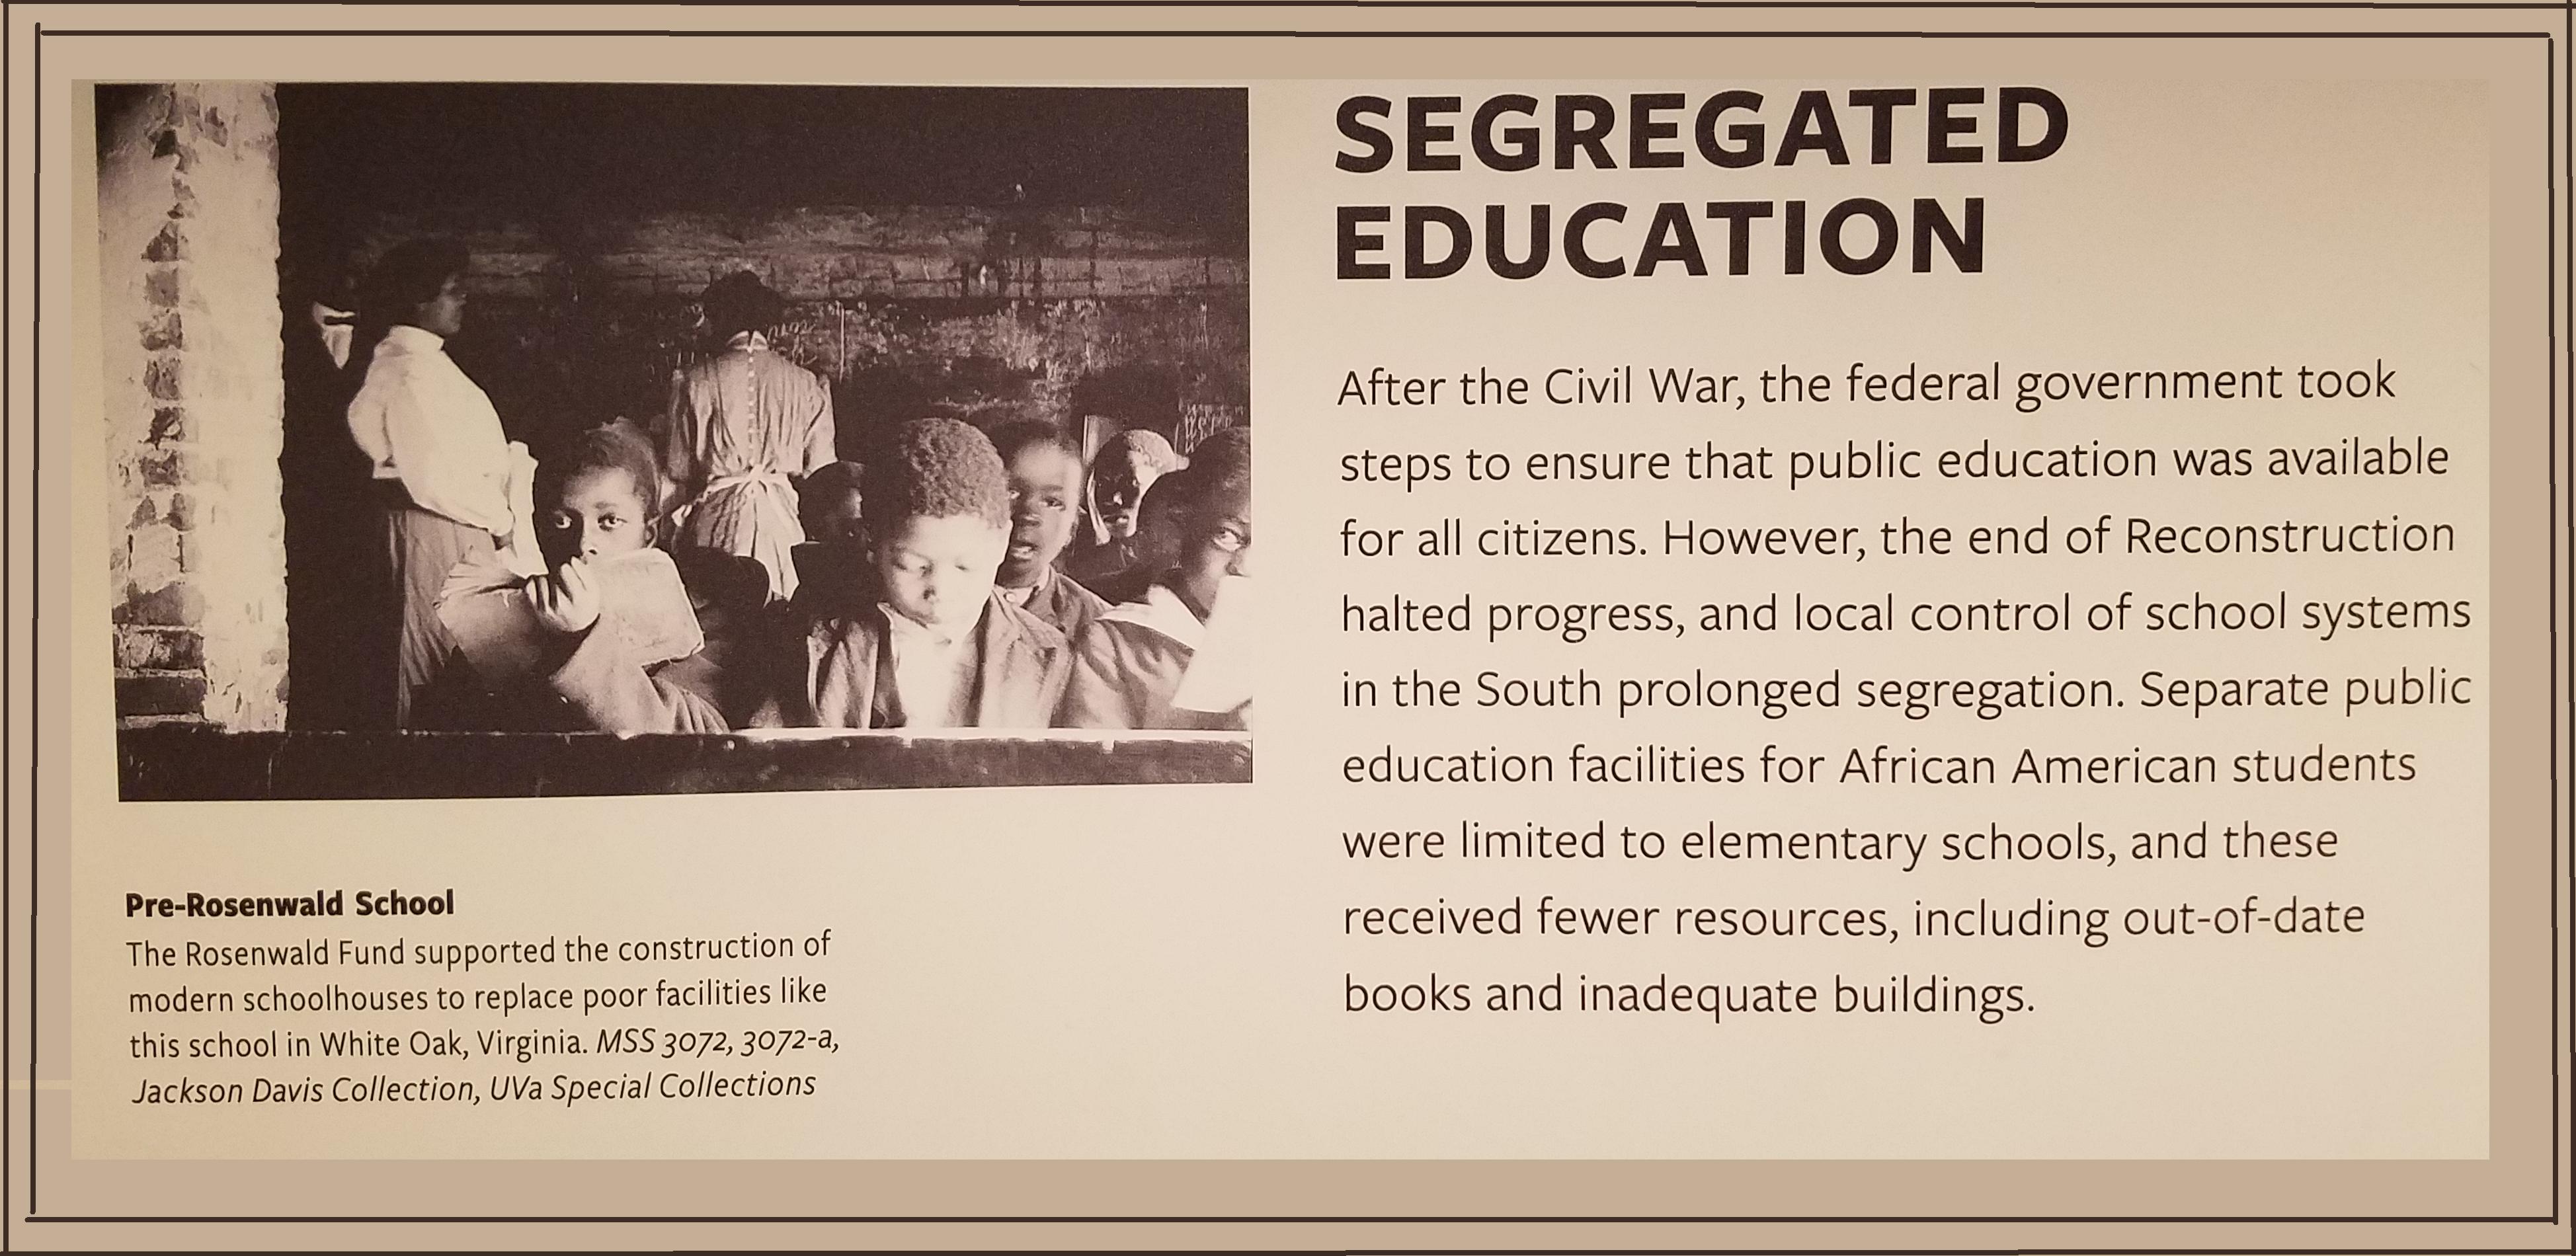 Segregated Education